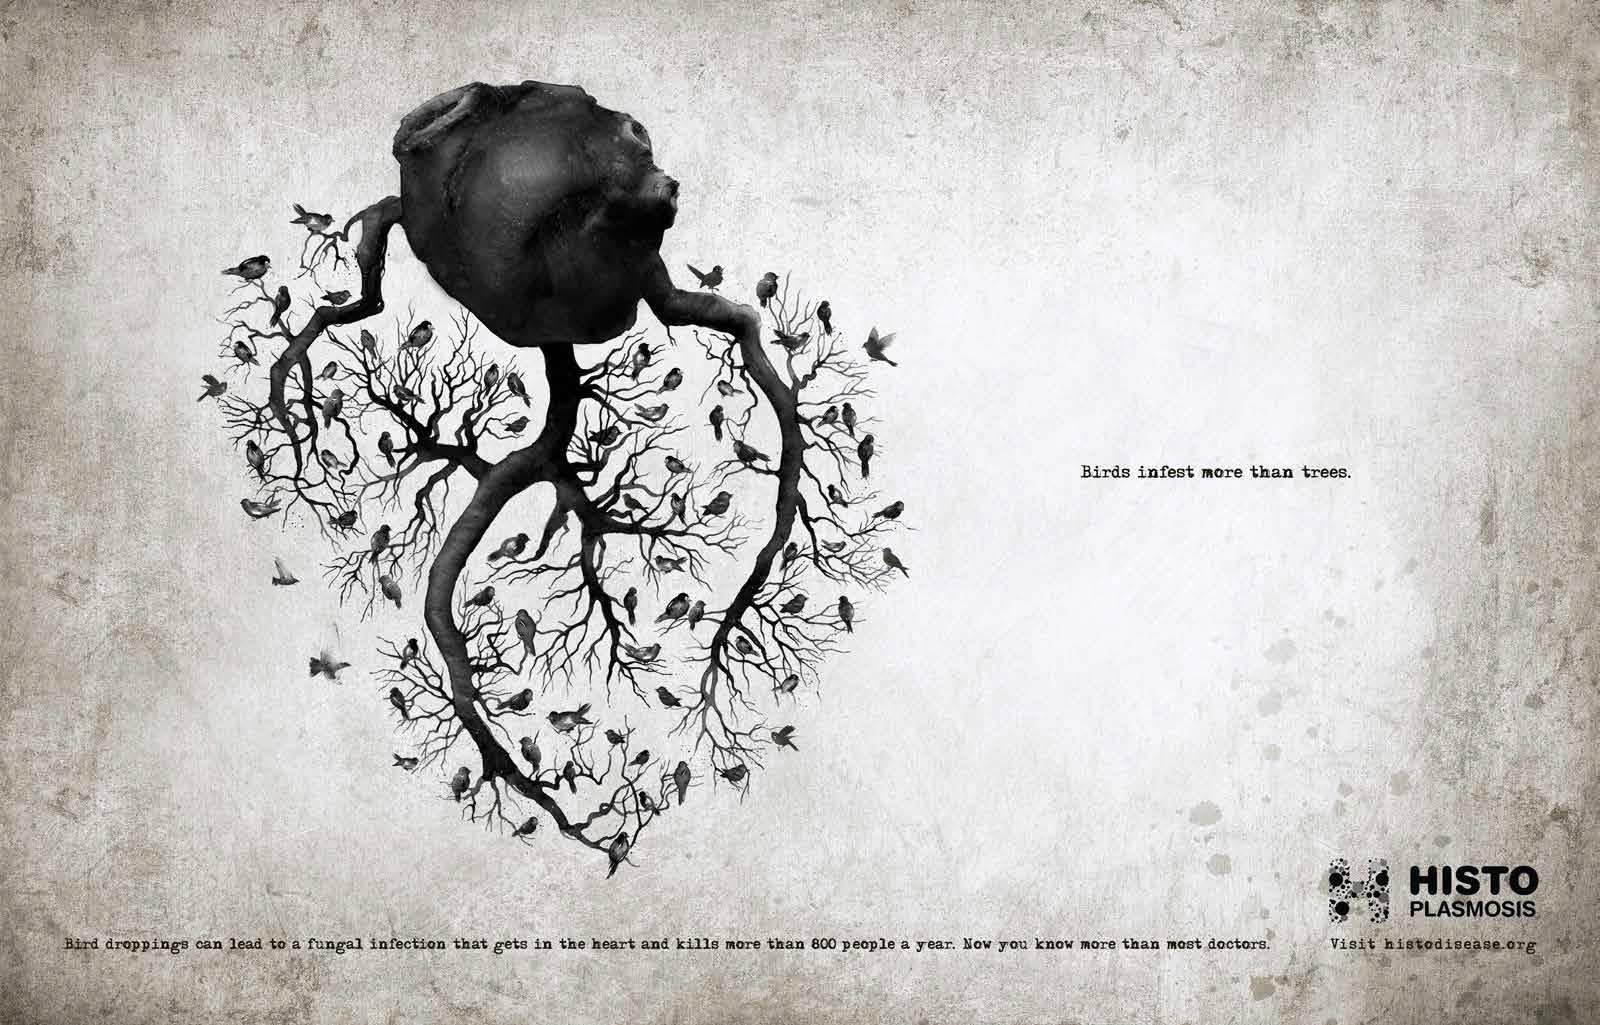 Histoplasmosis-Heart